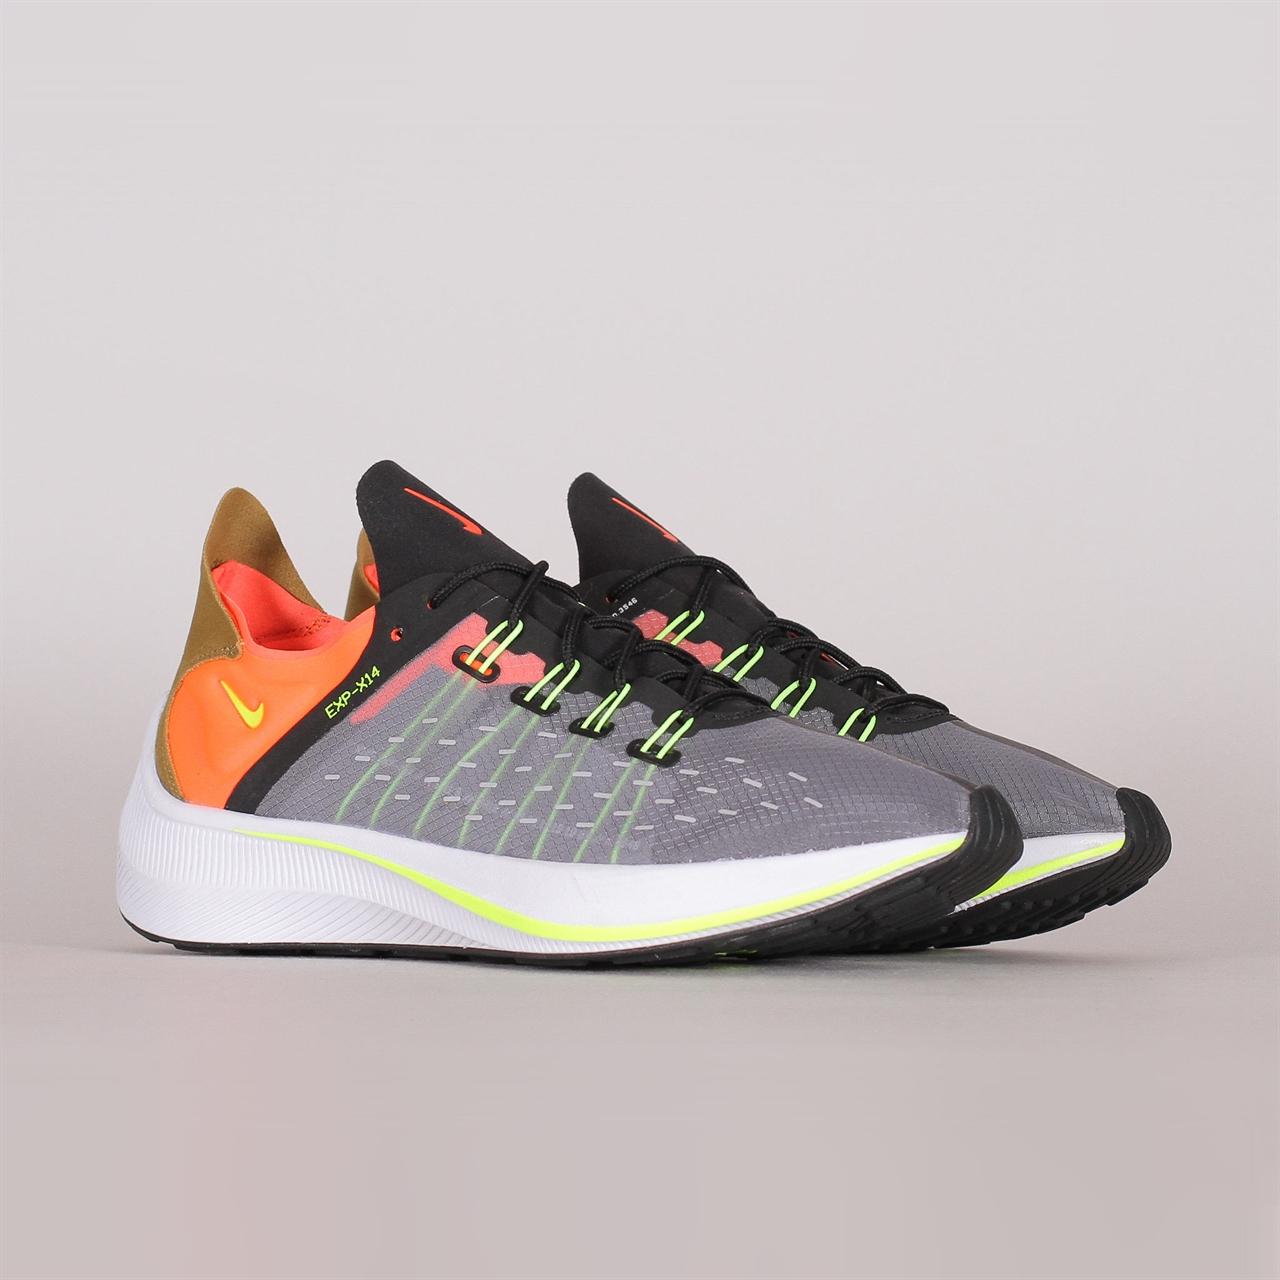 36c0d3d84406 Shelta - Nike Sportswear EXP X-14 (AO1554-001)